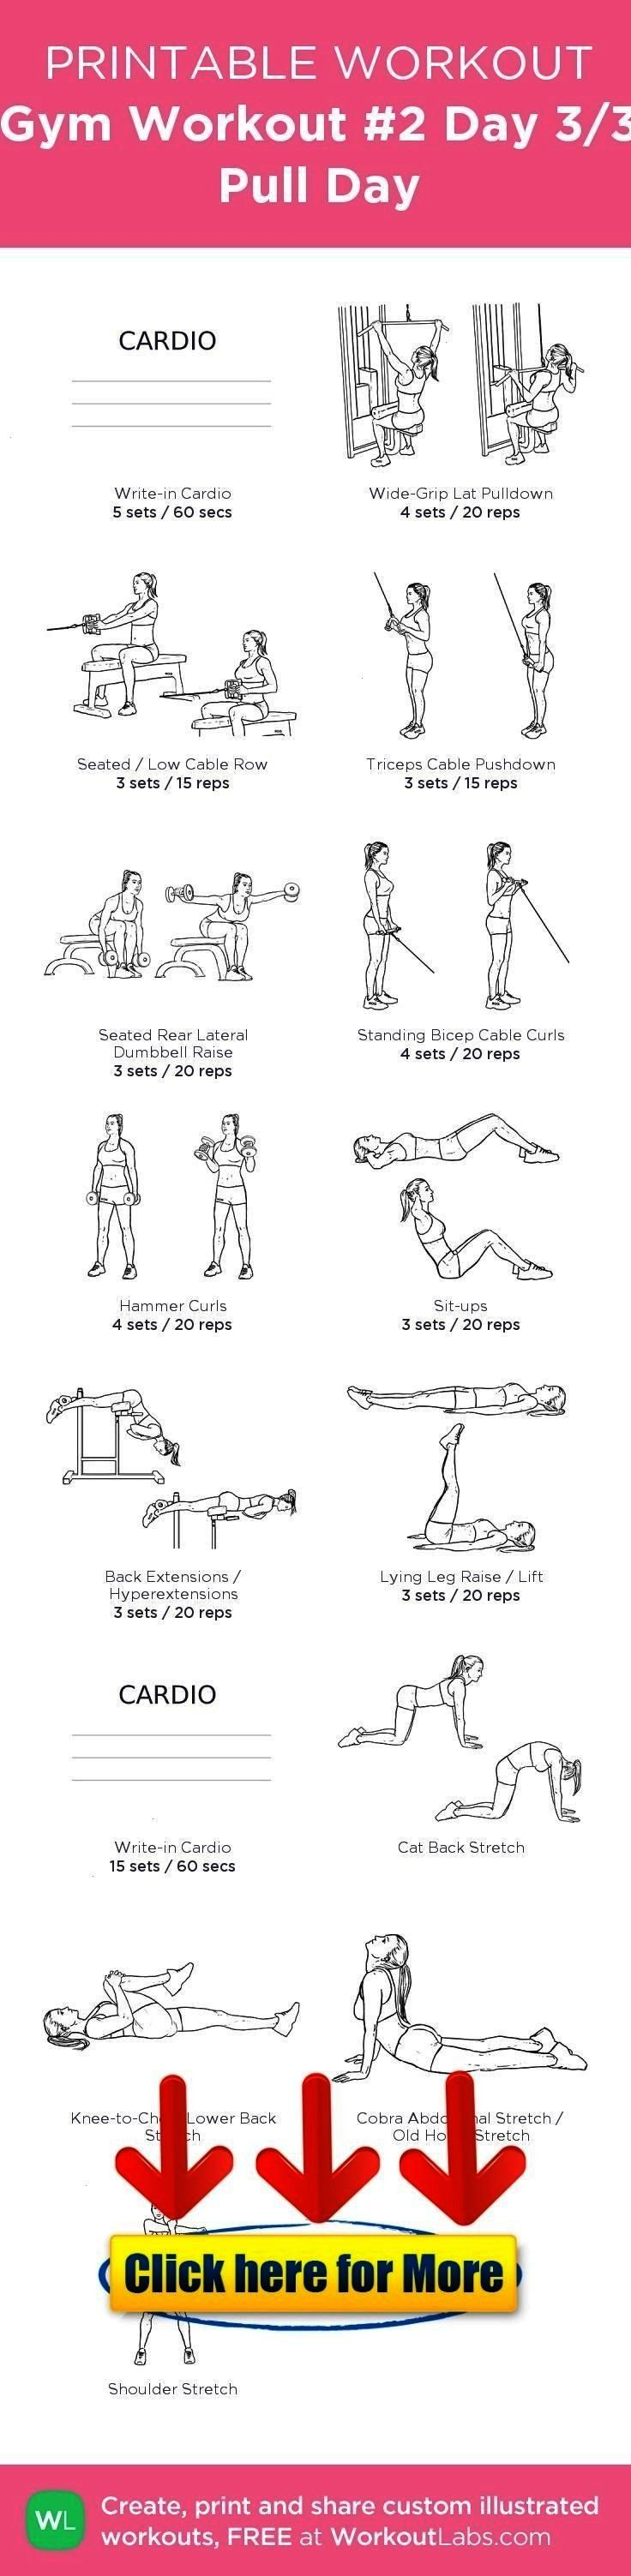 #workoutlabsco #workout #fitness #created #custom #worko #pull #2gym #my #day #gym #my #33 #gy #atW...